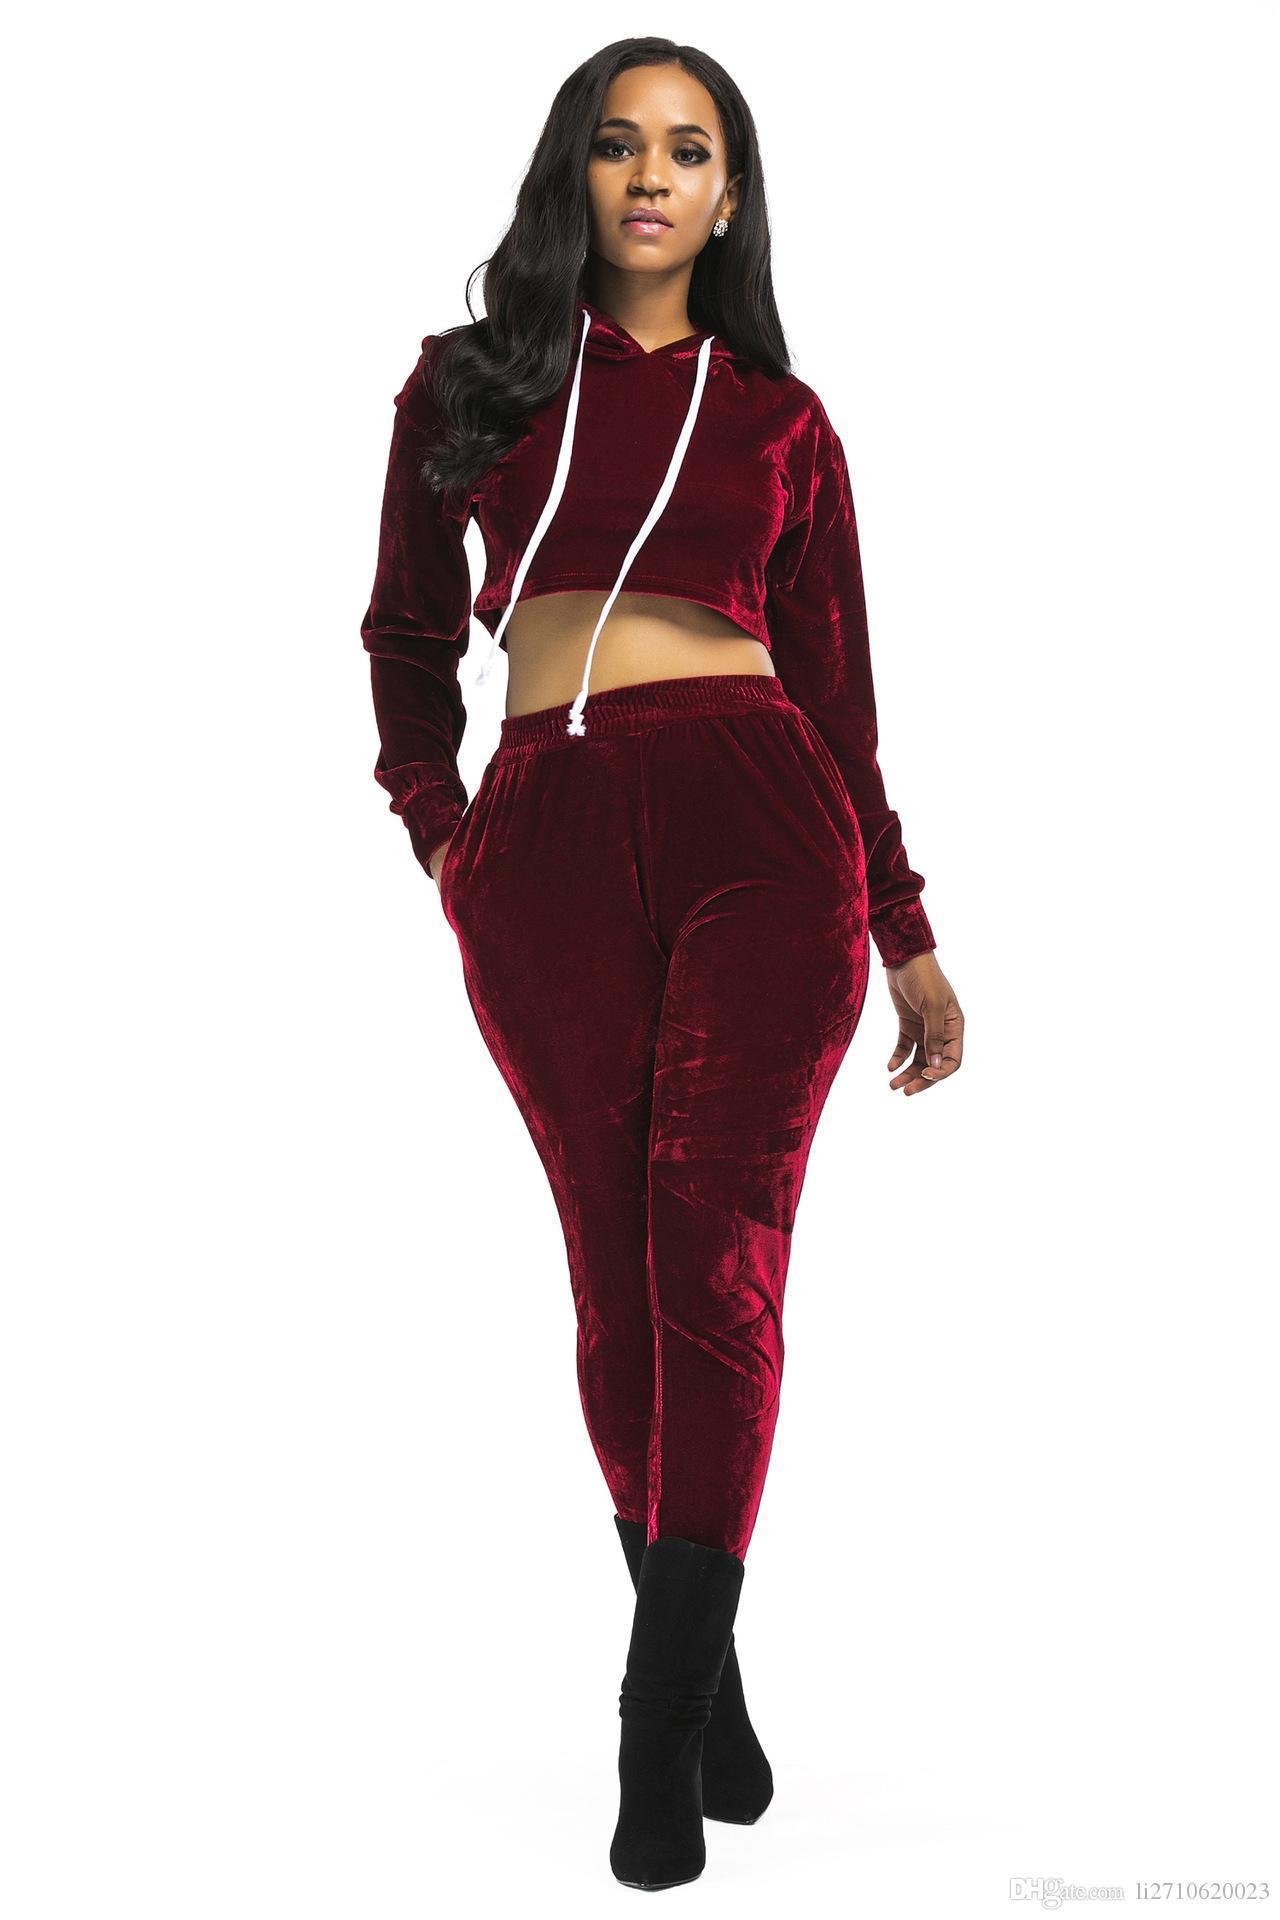 New Arrival 2018 Velour Tracksuit Women 2 Piece Set Top and Pants Velvet Tracksuits Sweatsuit Hoodie Sweatshirt Plus Size